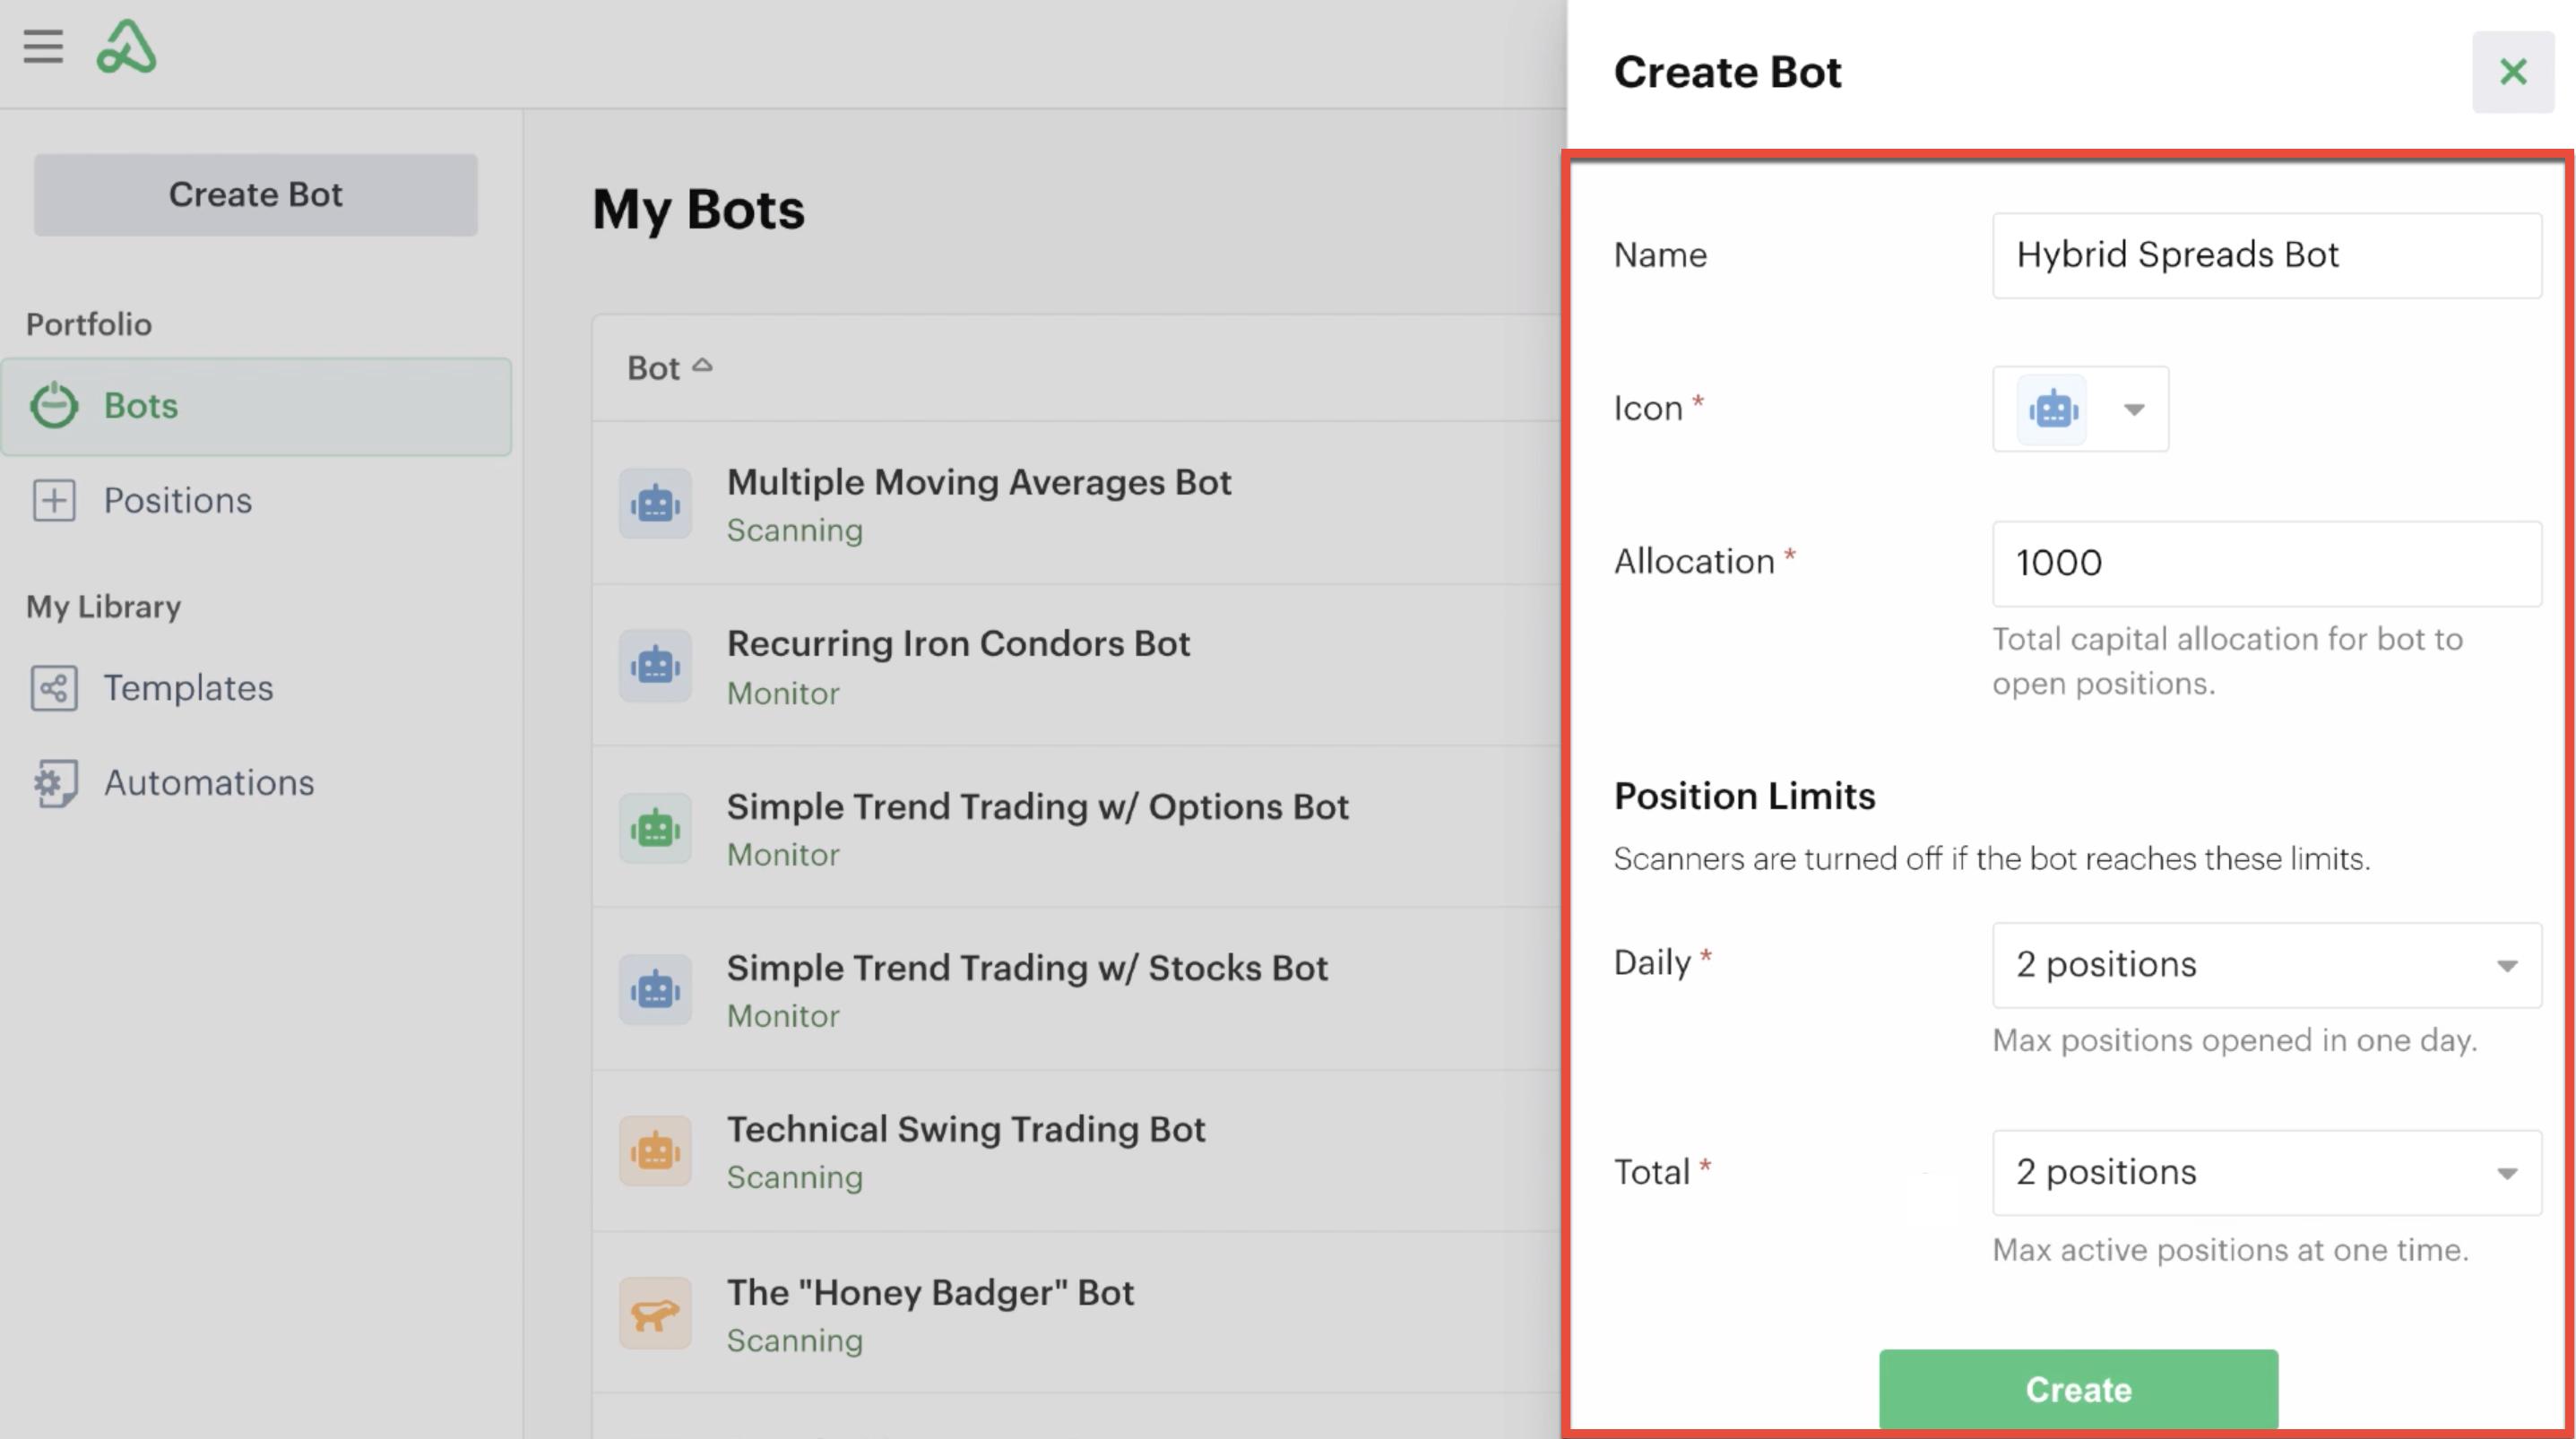 Bot global settings